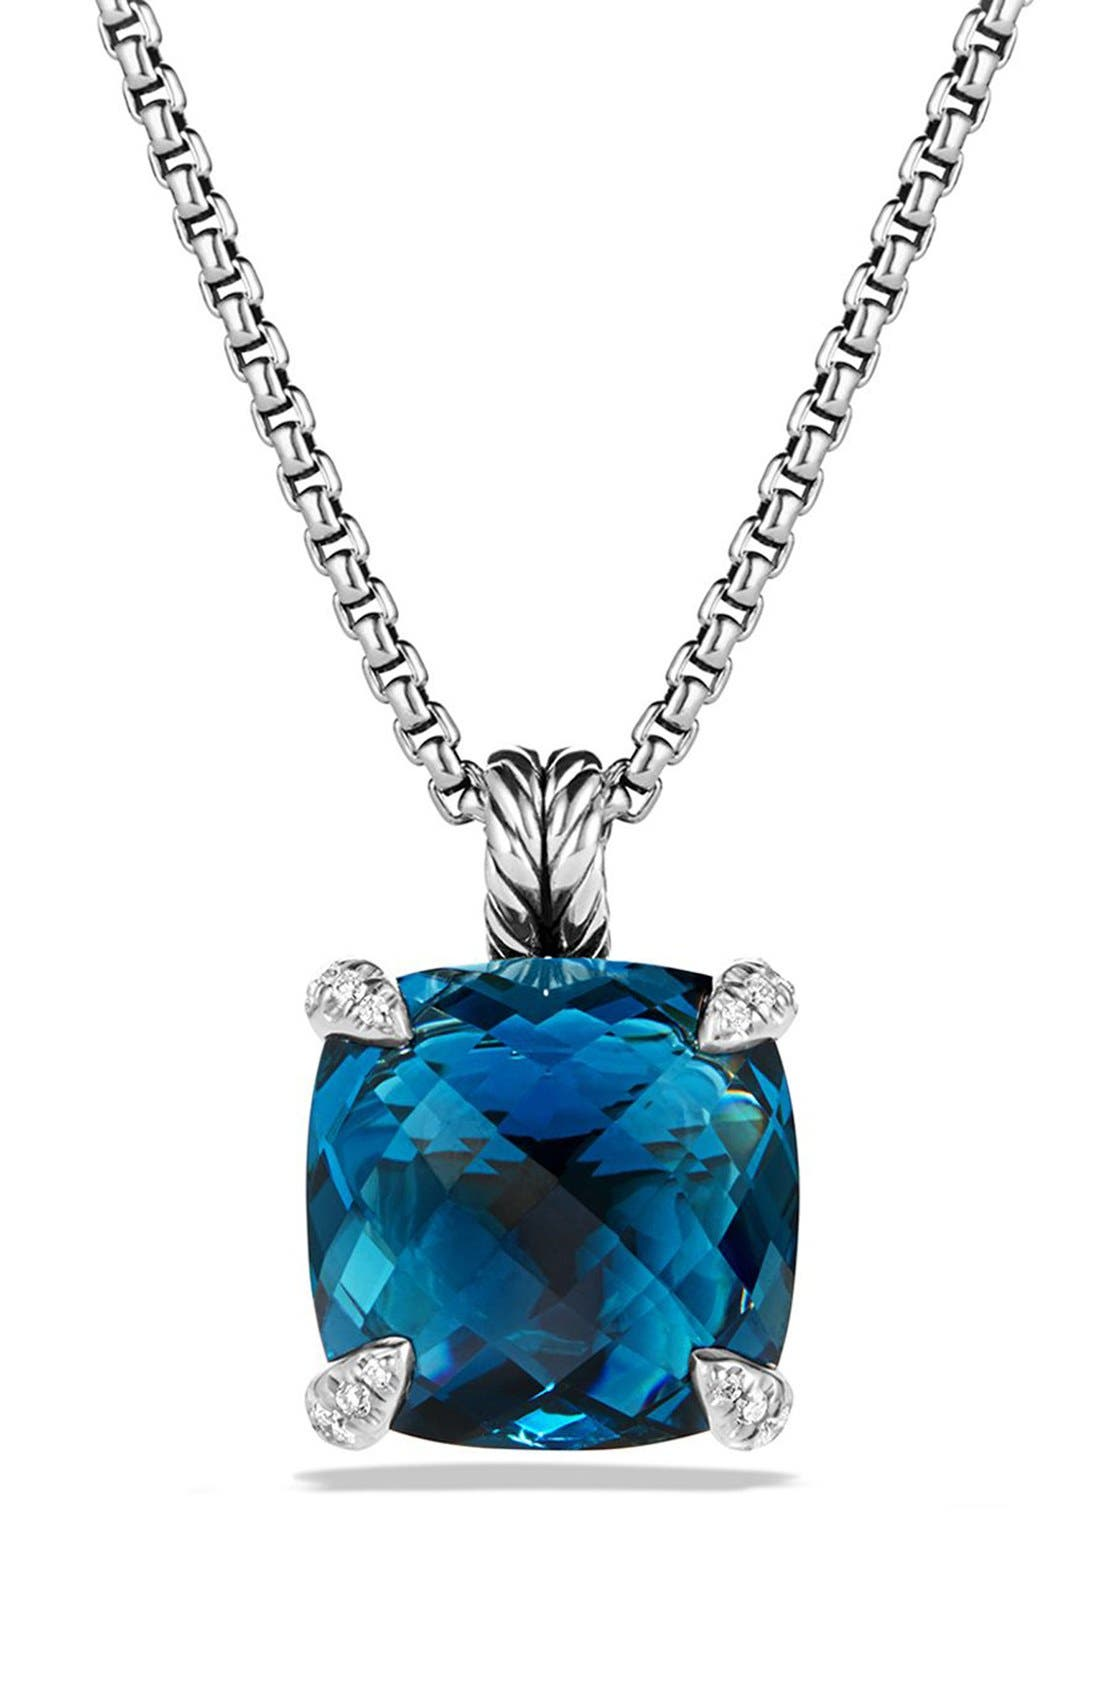 Alternate Image 1 Selected - David Yurman 'Châtelaine' Pendant Necklace with Semiprecious Stone and Diamonds